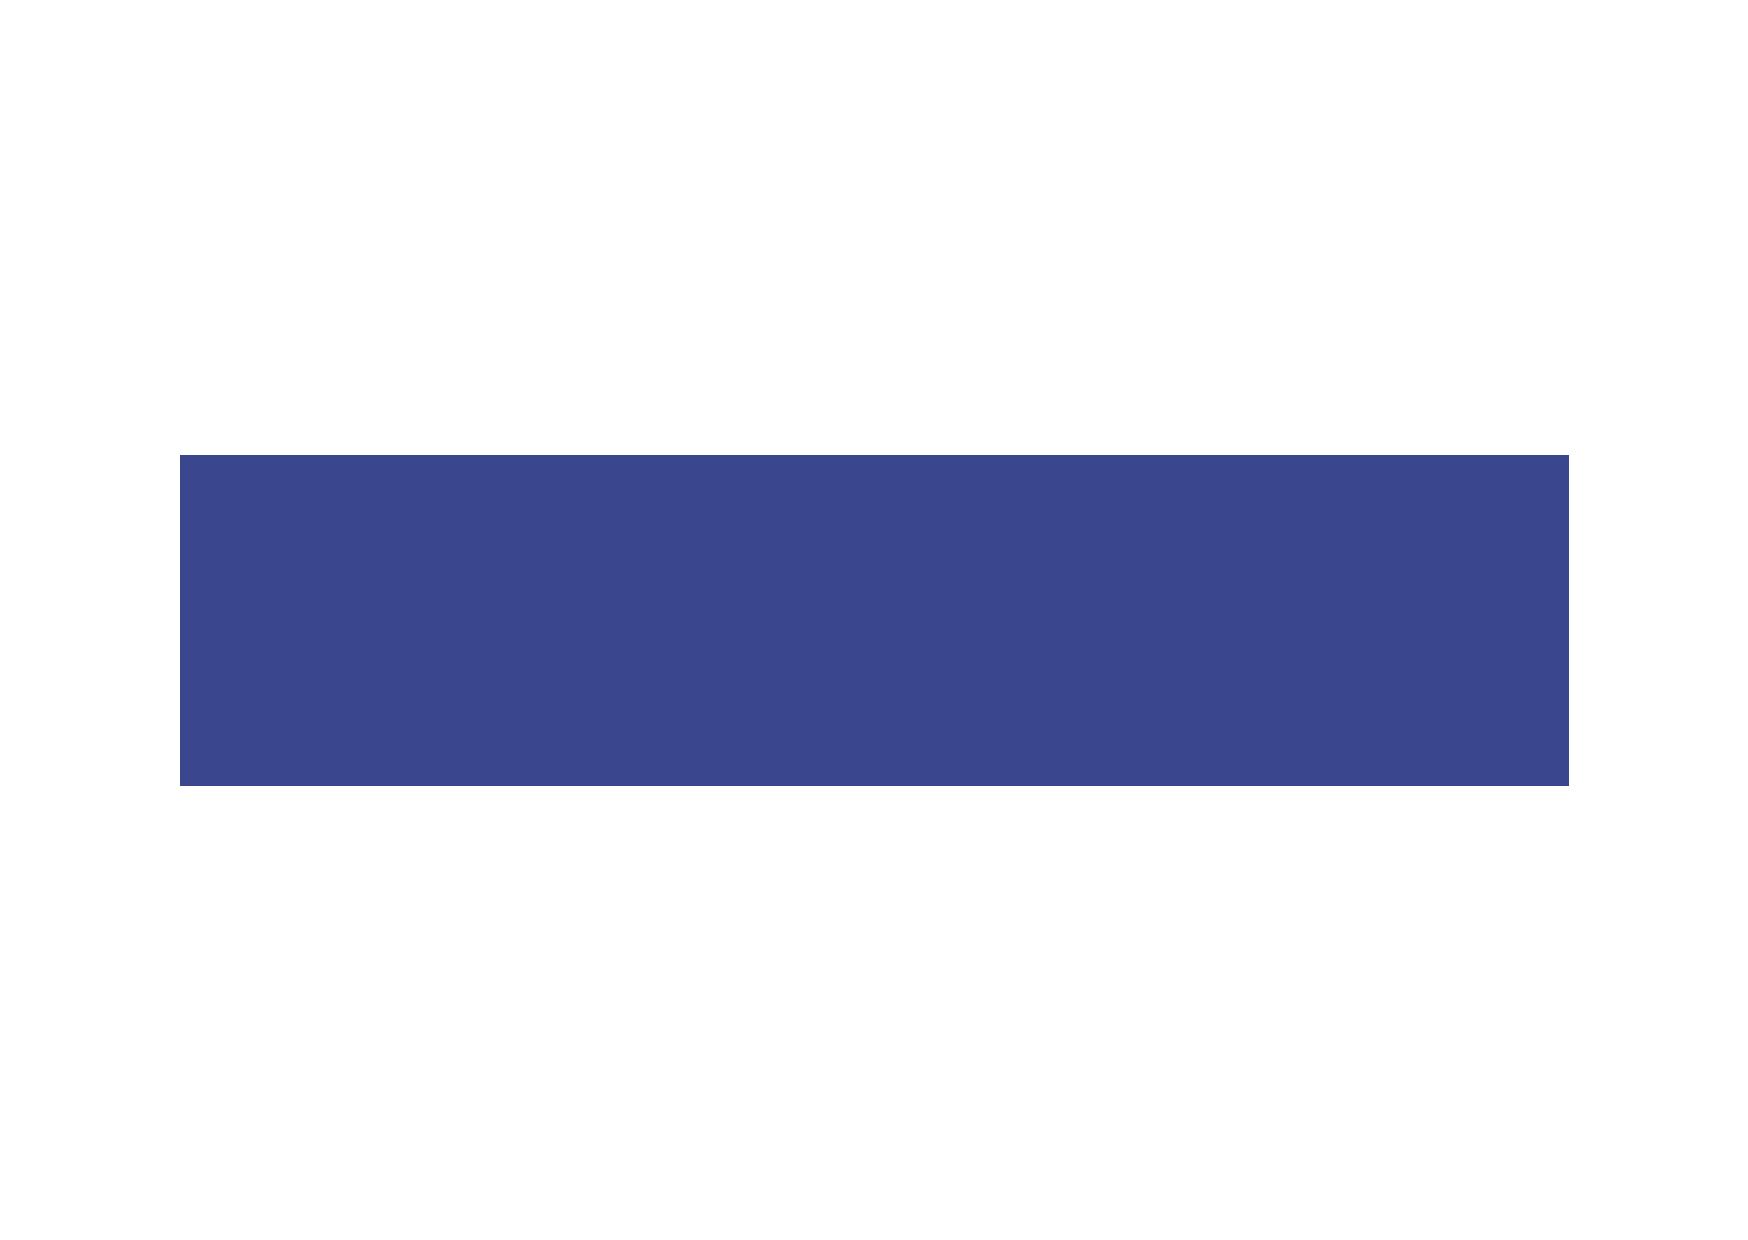 Illustration Airwell logo